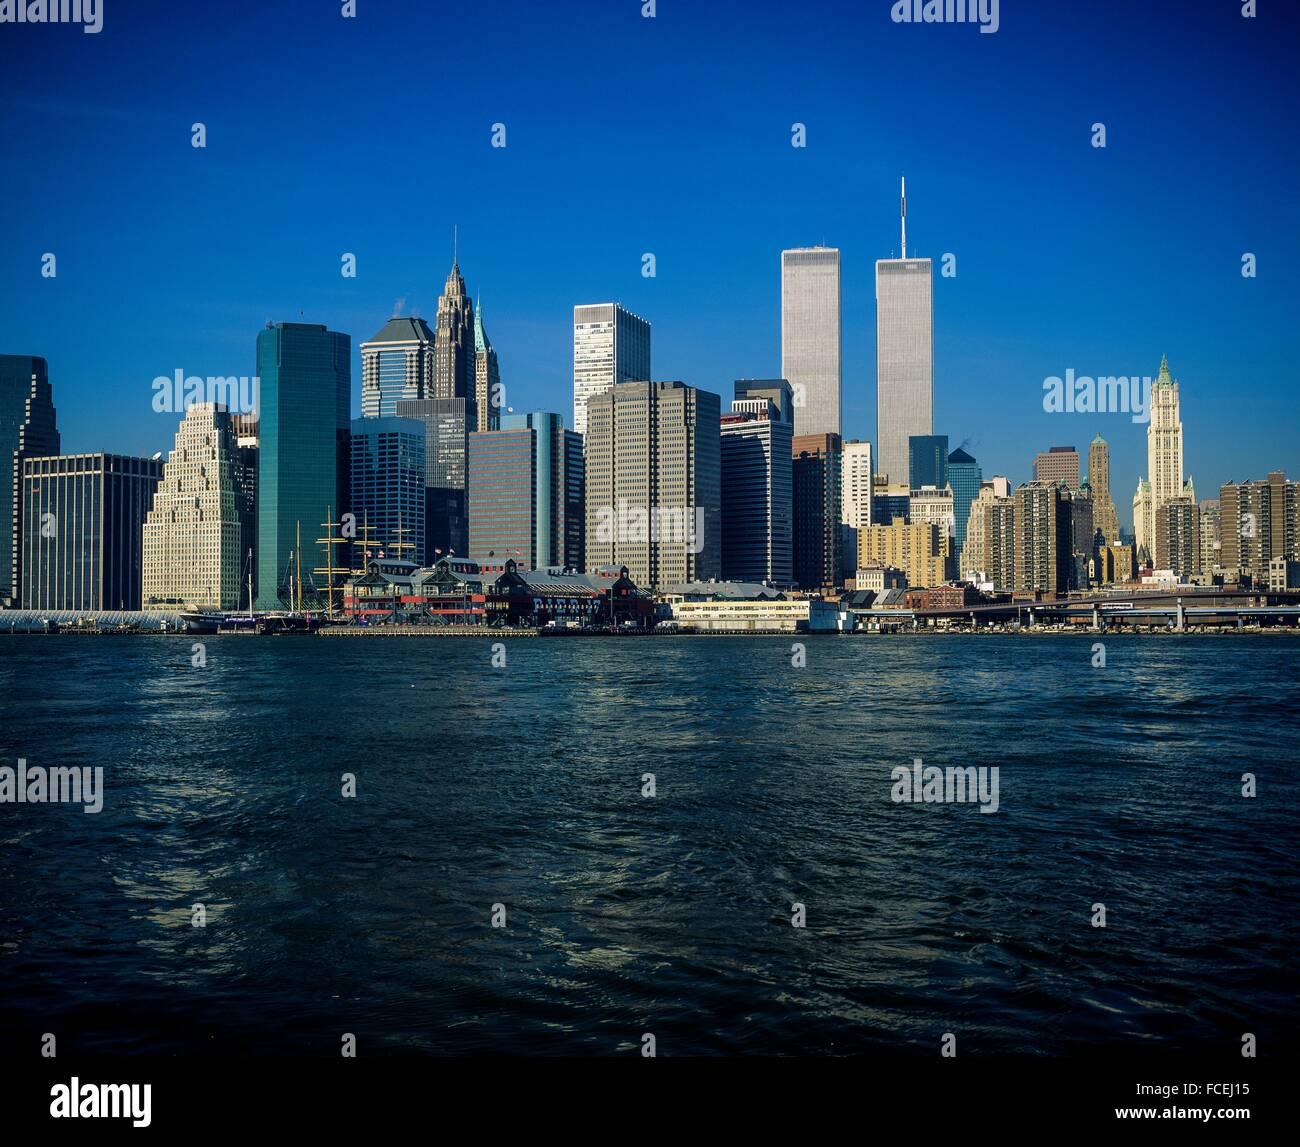 Manhattan To New York City: 2001 New York City Stock Photos & 2001 New York City Stock